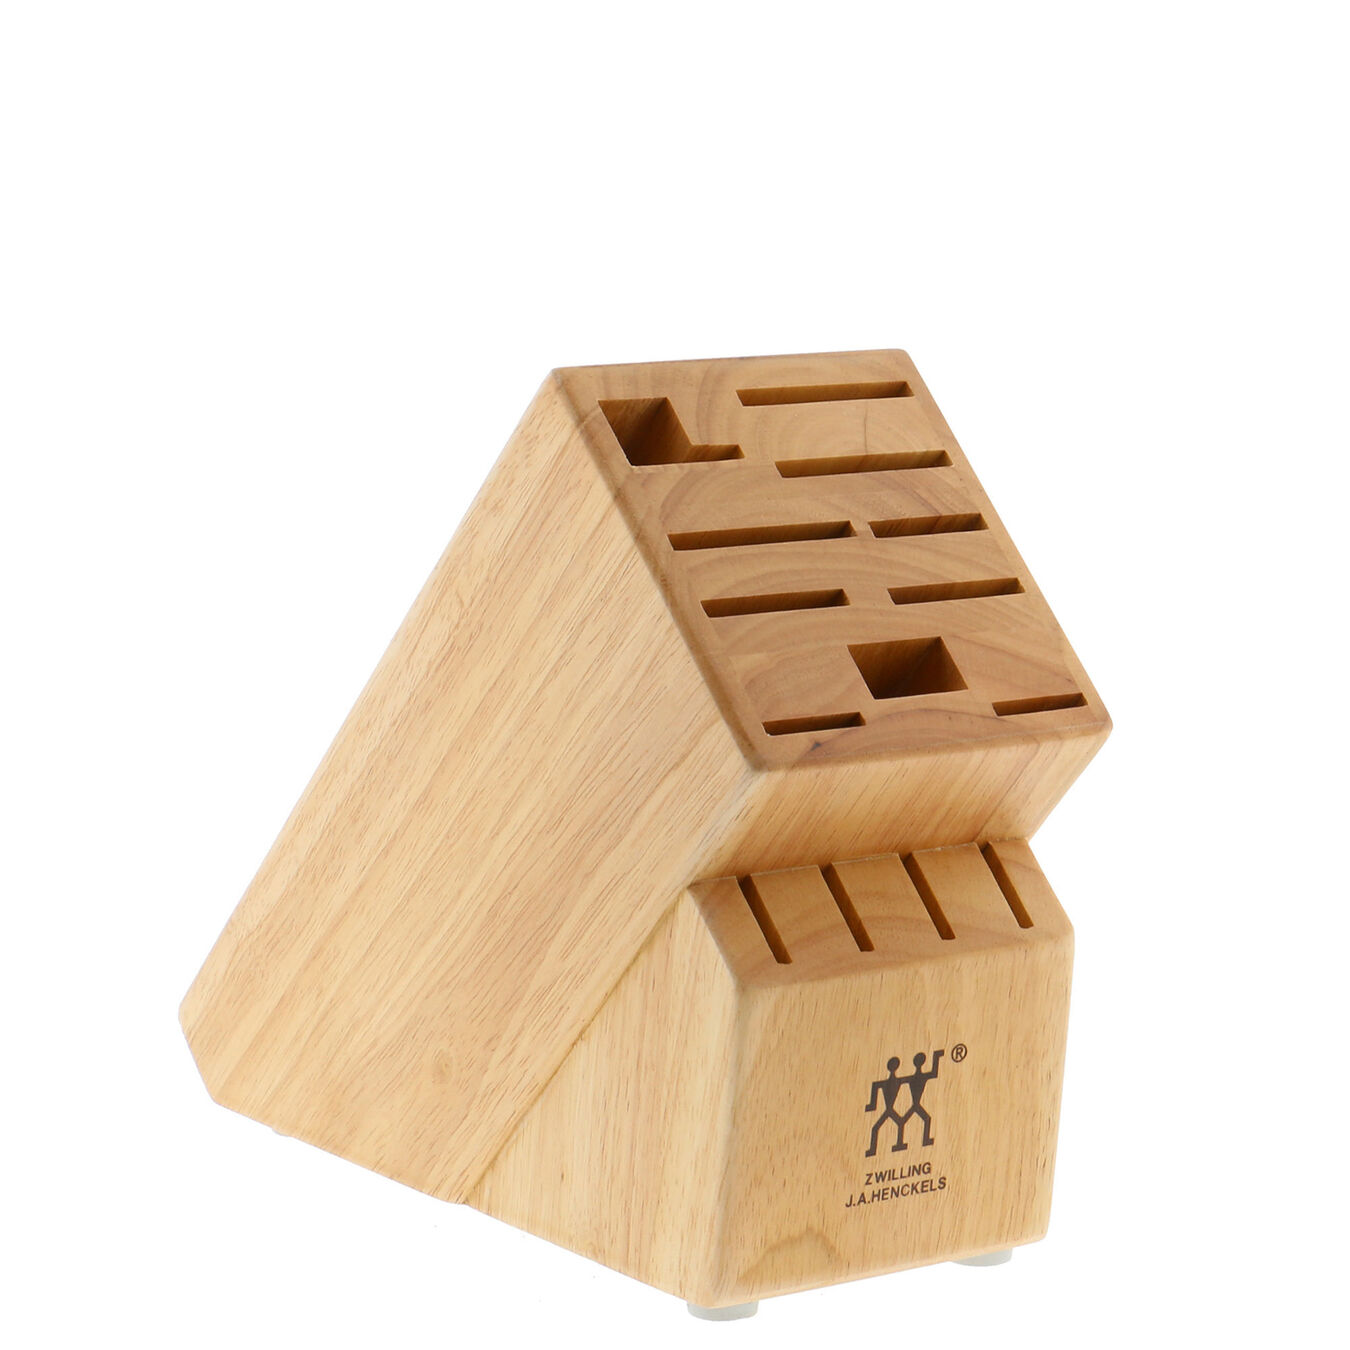 14-pc Knife Block Set,,large 13